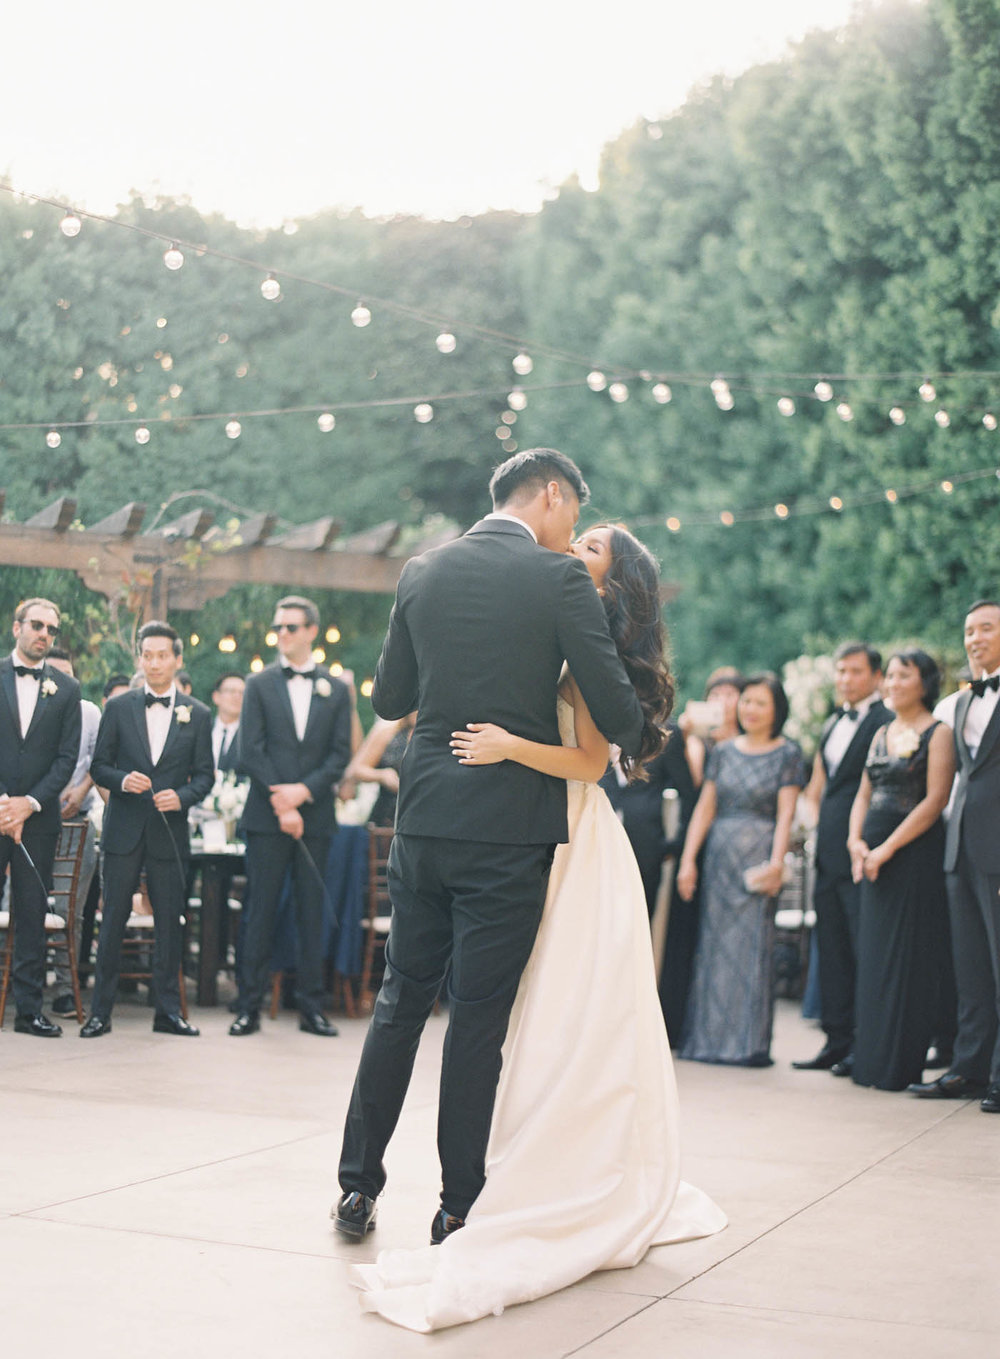 franciscan-gardens-wedding-22-Jen_Huang-000757-R1-007.jpg